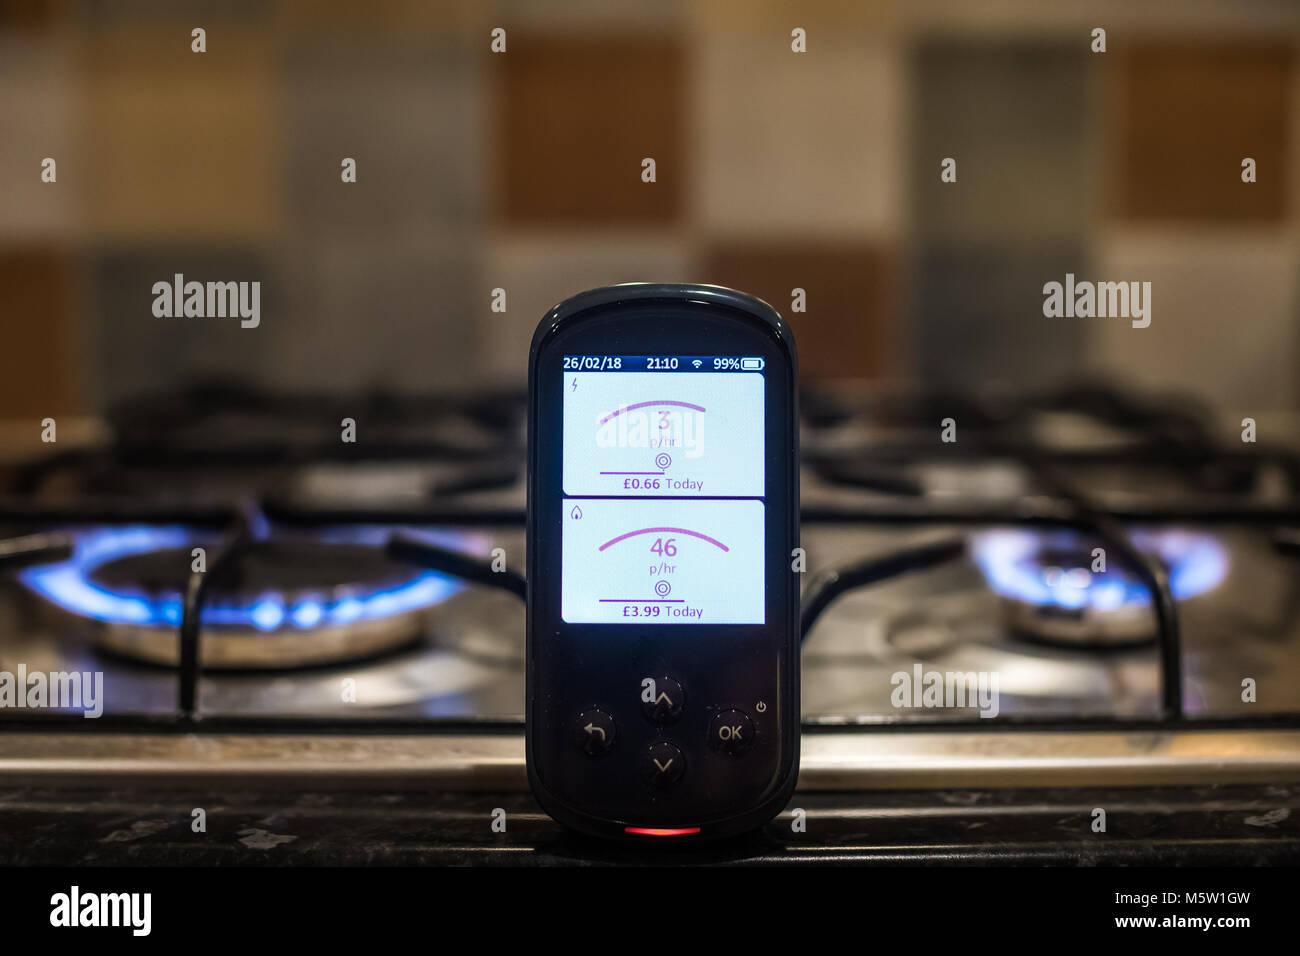 Smart Metering Showing Live Data - Stock Image